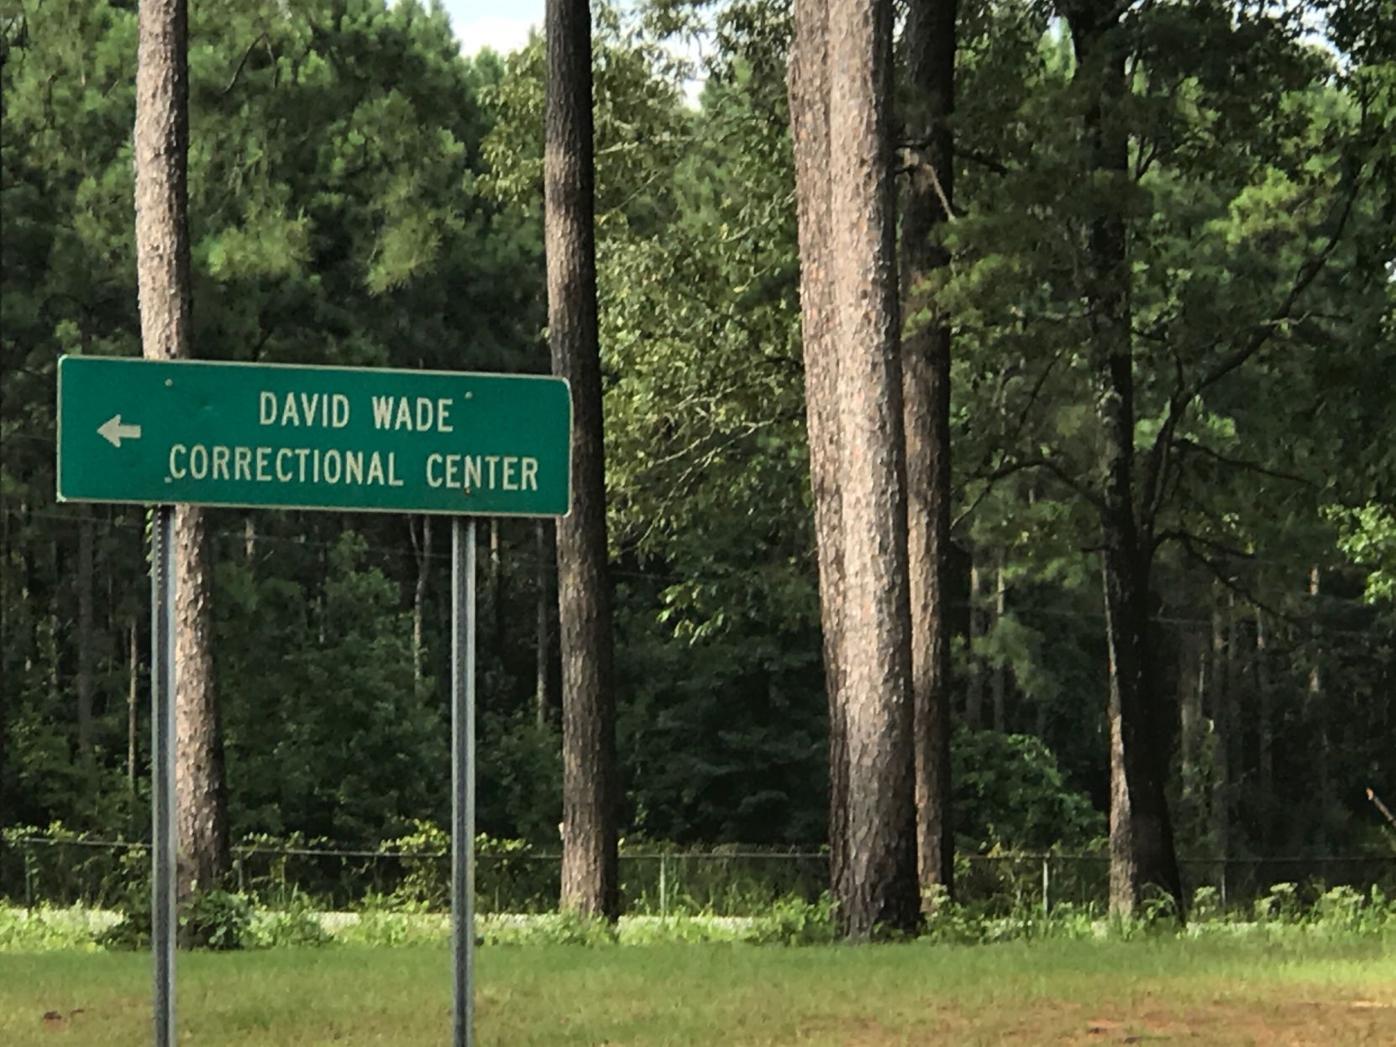 David Wade Correctional Center